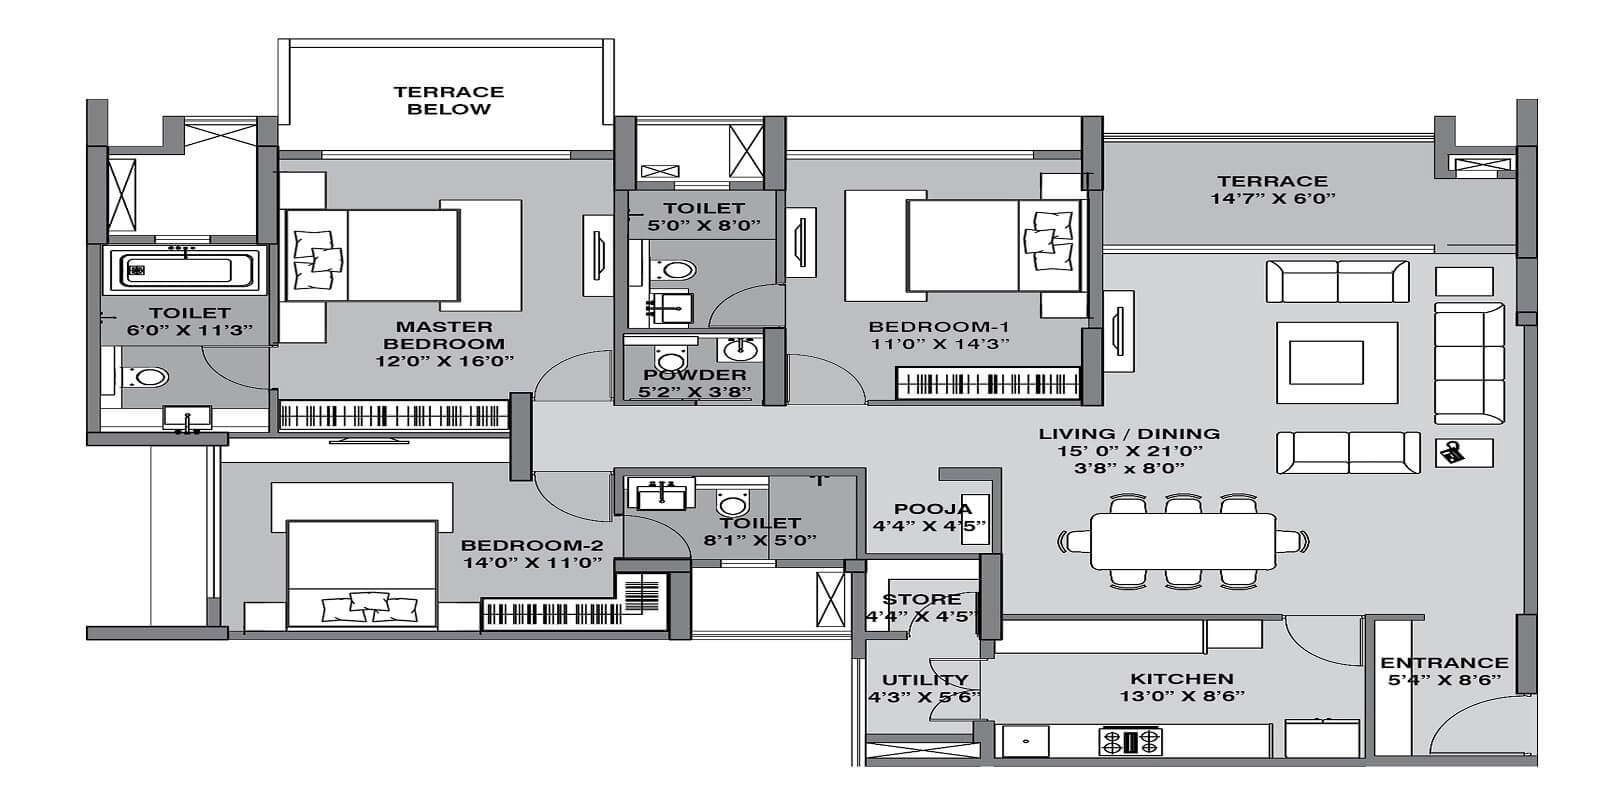 lodha belmondo apartment 3bhk 1431sqft 1